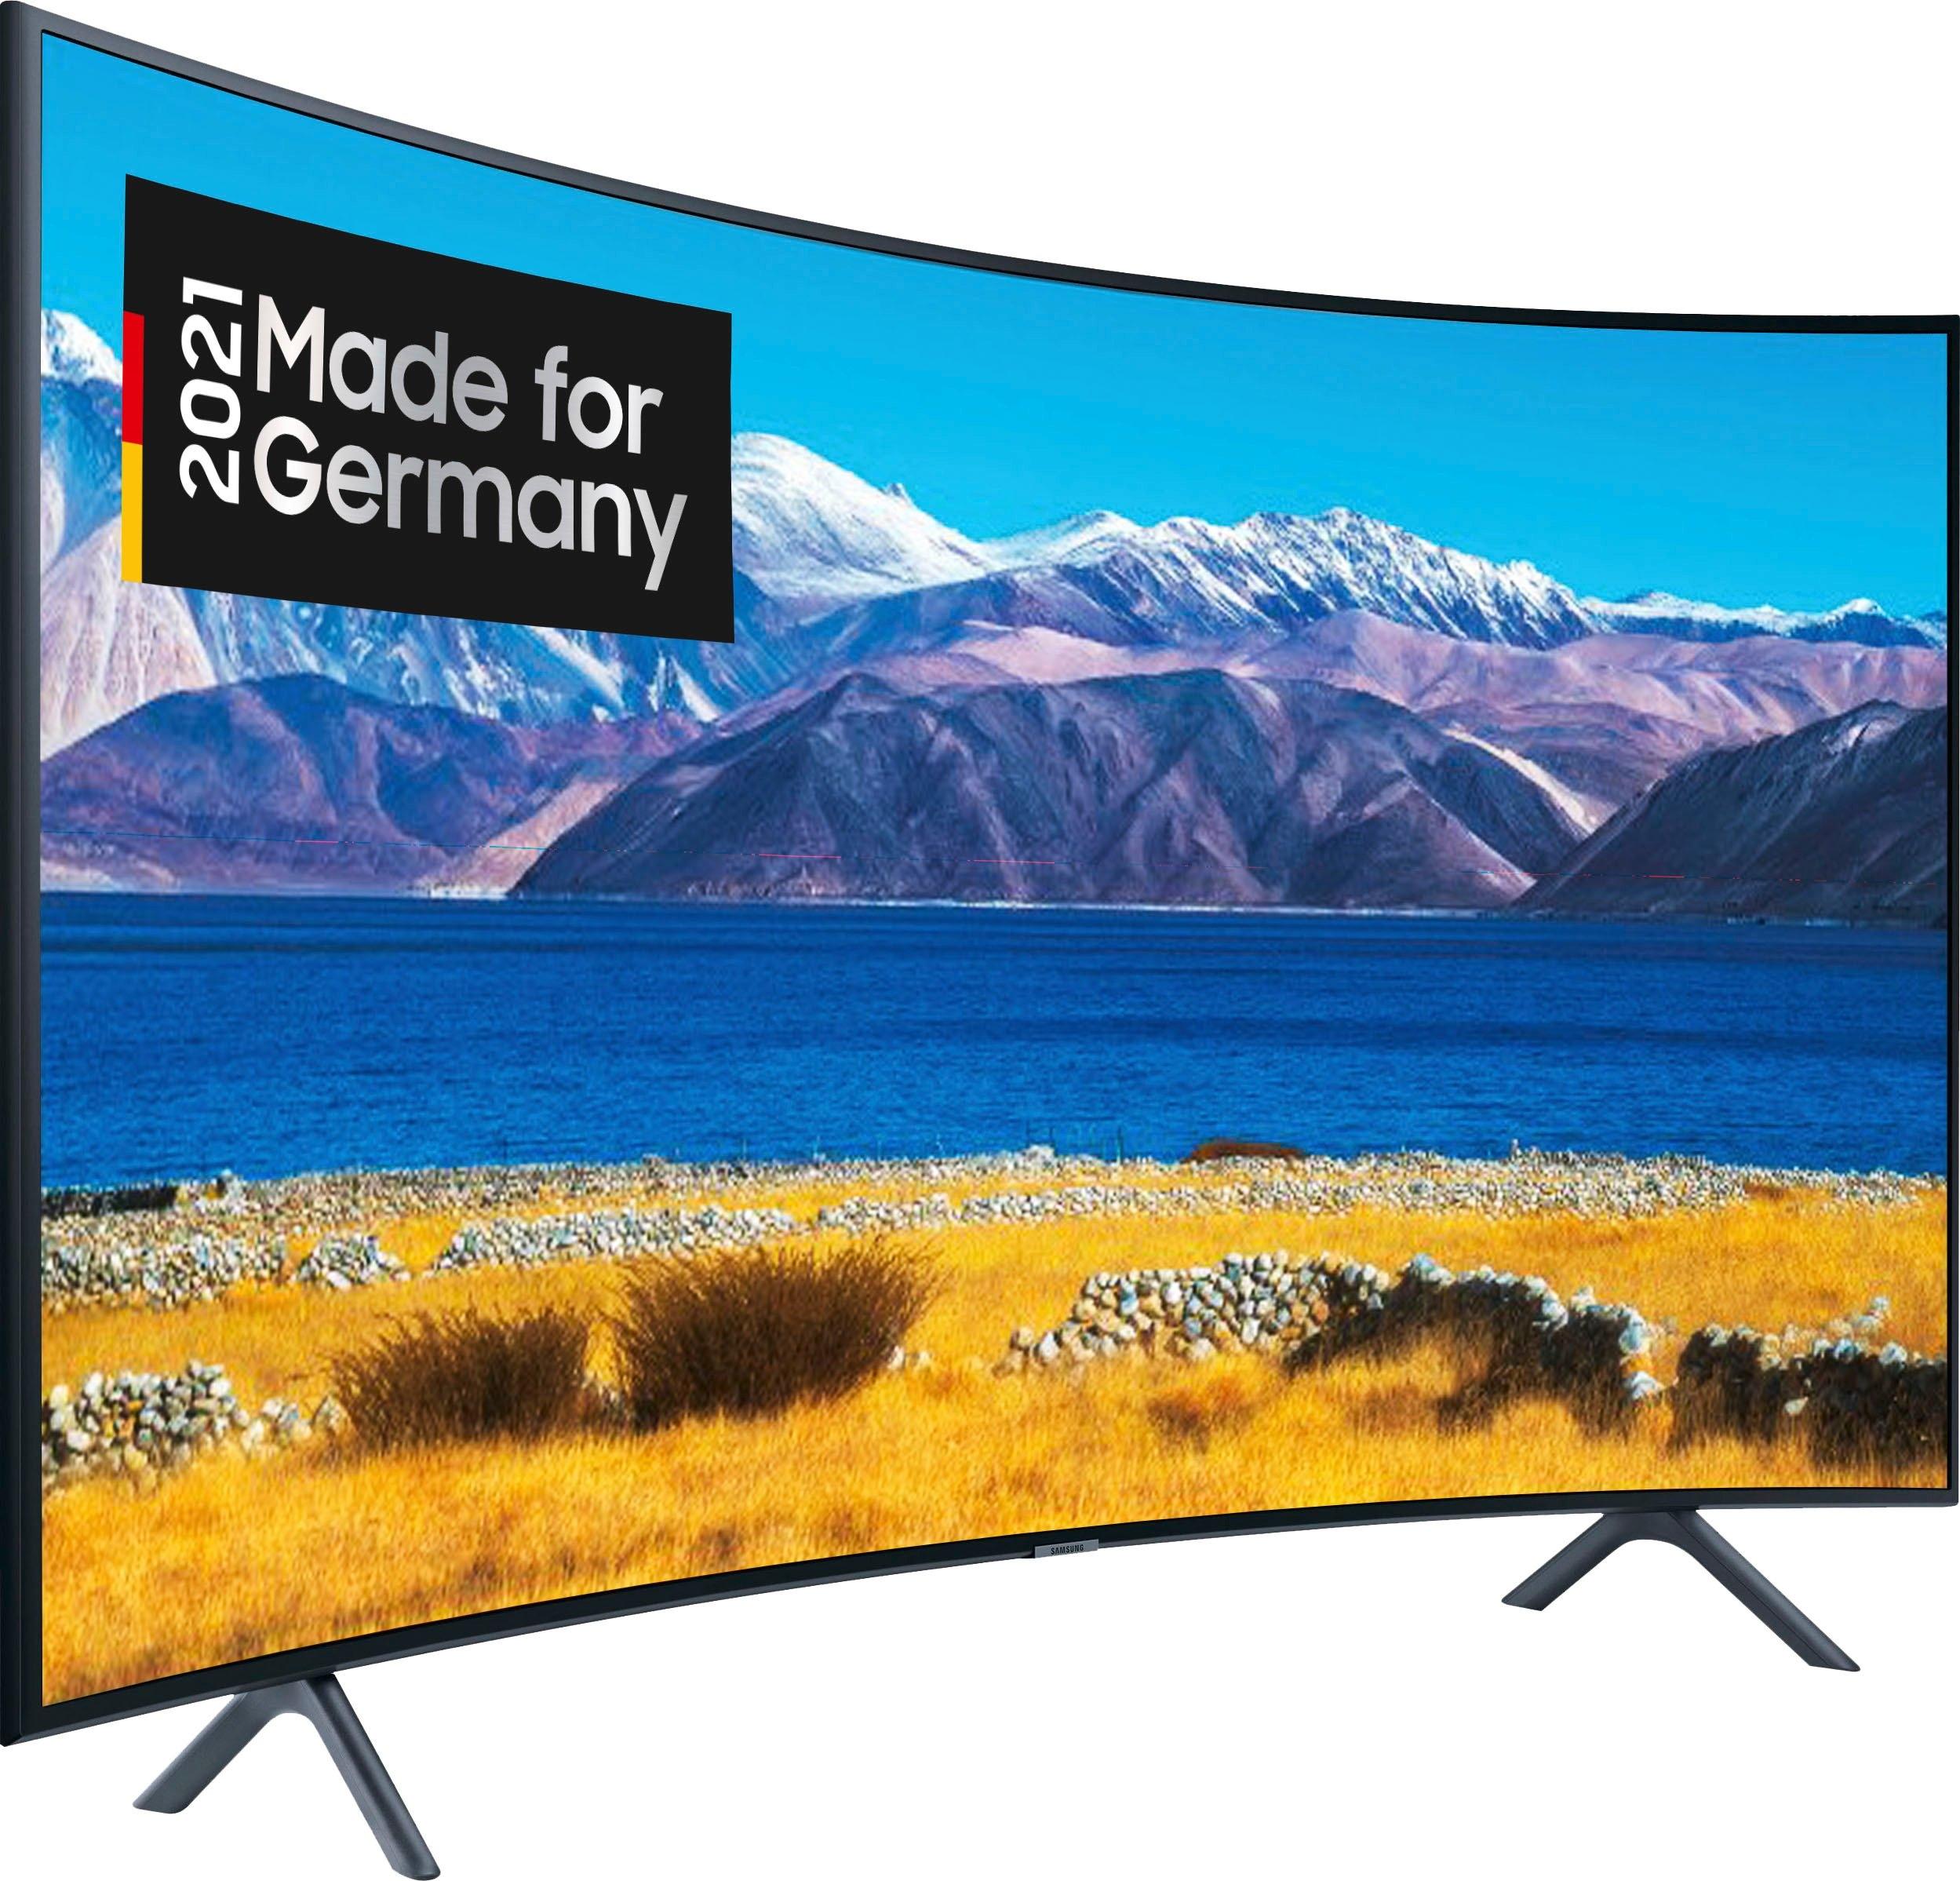 Samsung Curved LED-TV GU55TU8379U, 138 cm / 55